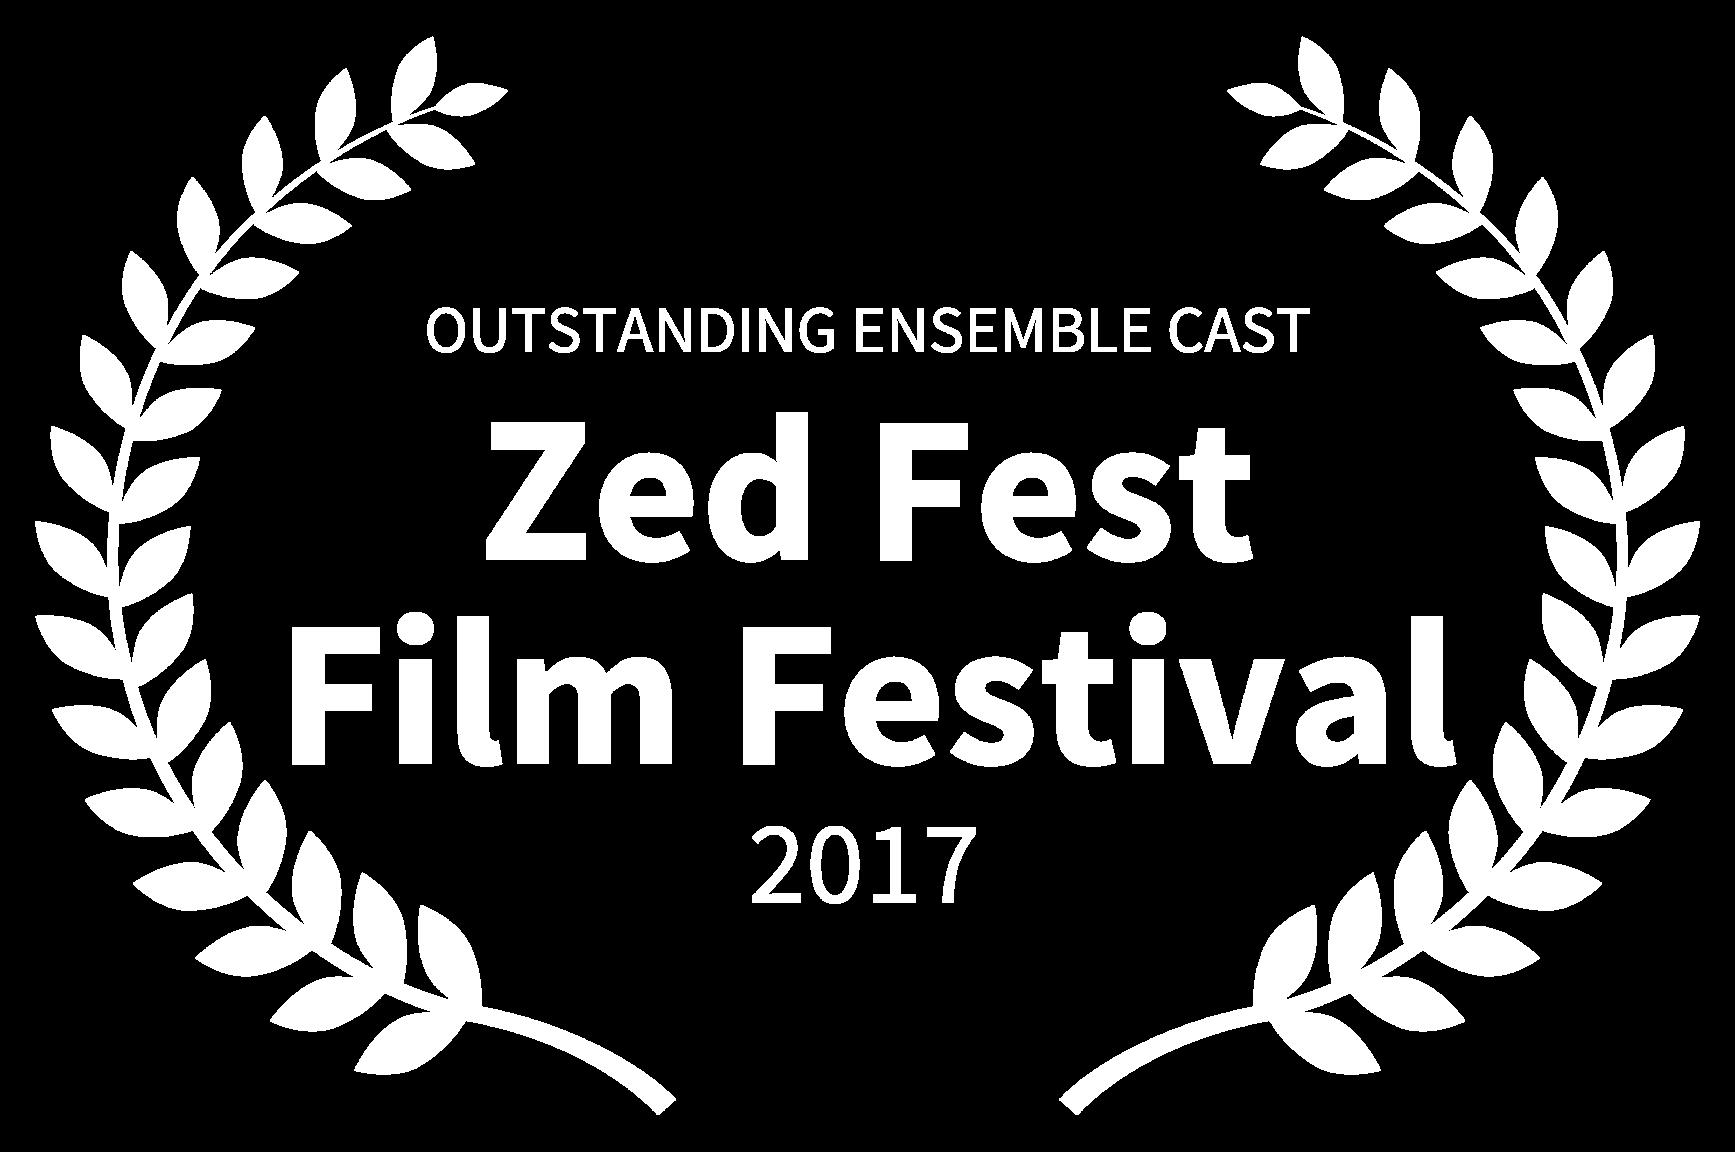 OUTSTANDING ENSEMBLE CAST - Zed Fest Film Festival - 2017.png